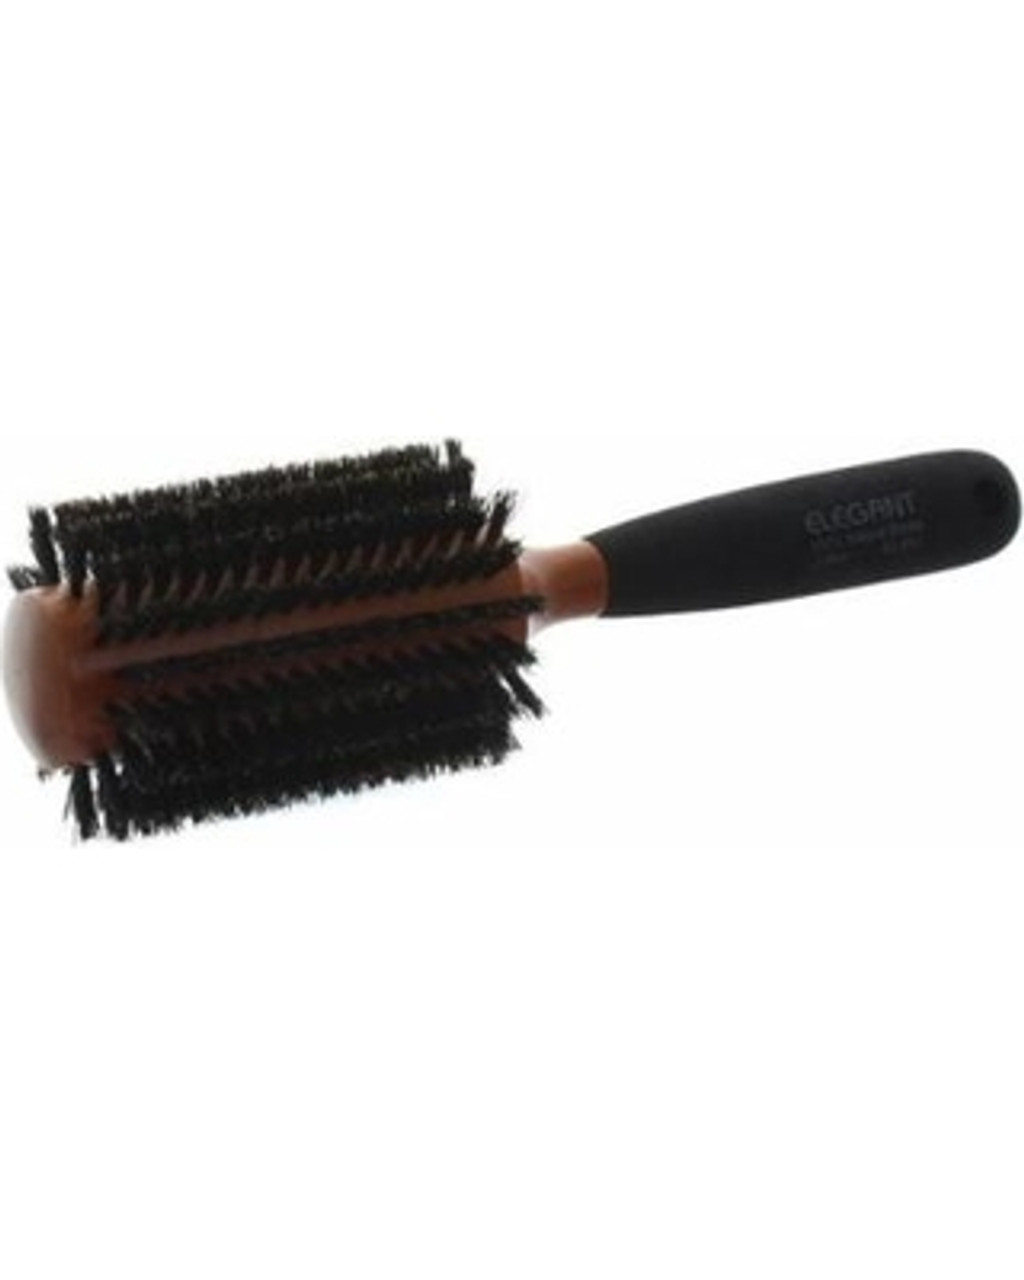 "Elegant Round Boar Brush 3"" 18 Rows"